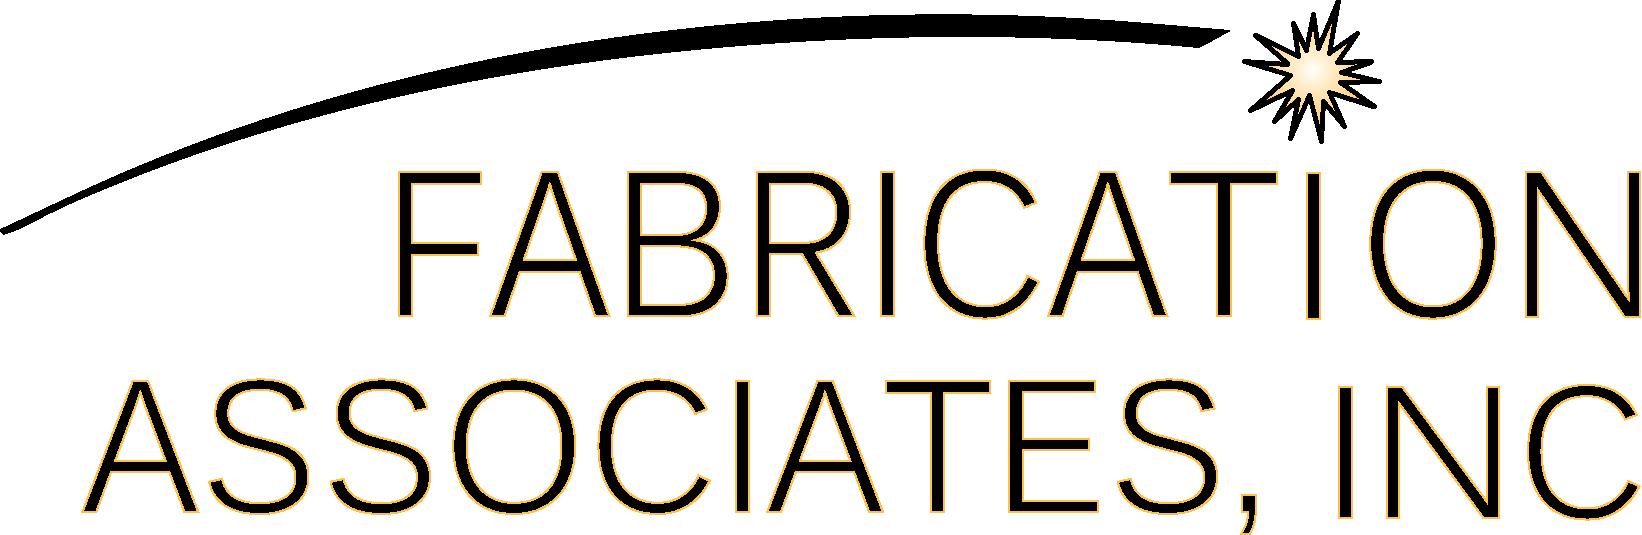 Fabrication Associates, Inc.